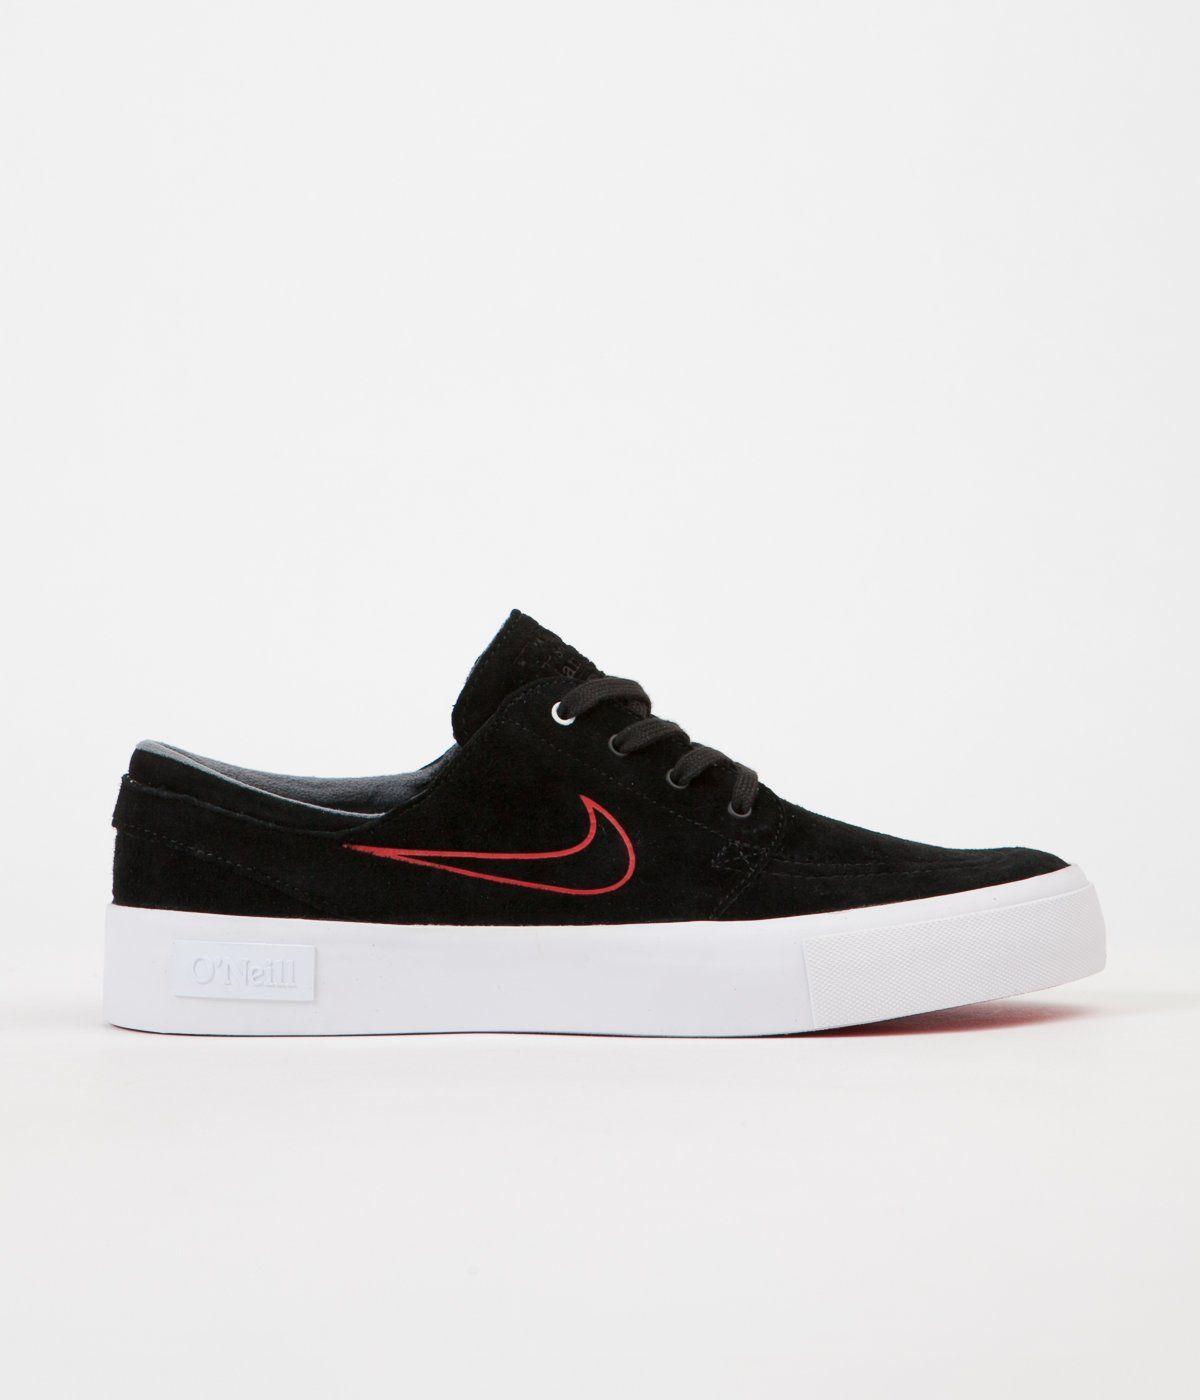 e1aed380c Nike SB Stefan Janoski HT Shane O'Neill Shoes - Black / University Red -  White